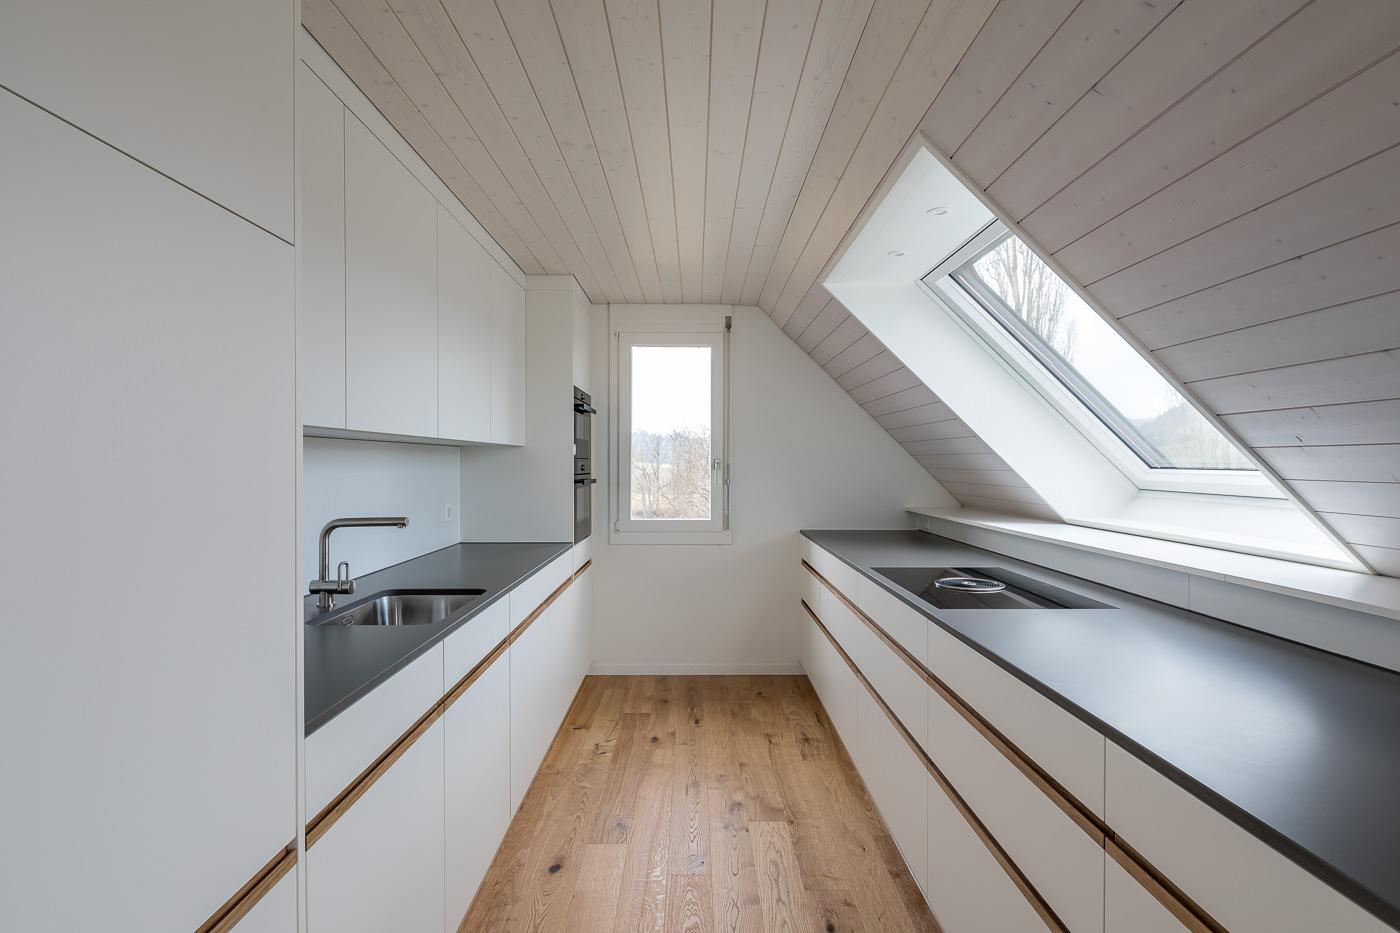 buan architekten – Umbau Attikawohnung Willisau – Foto – Kueche